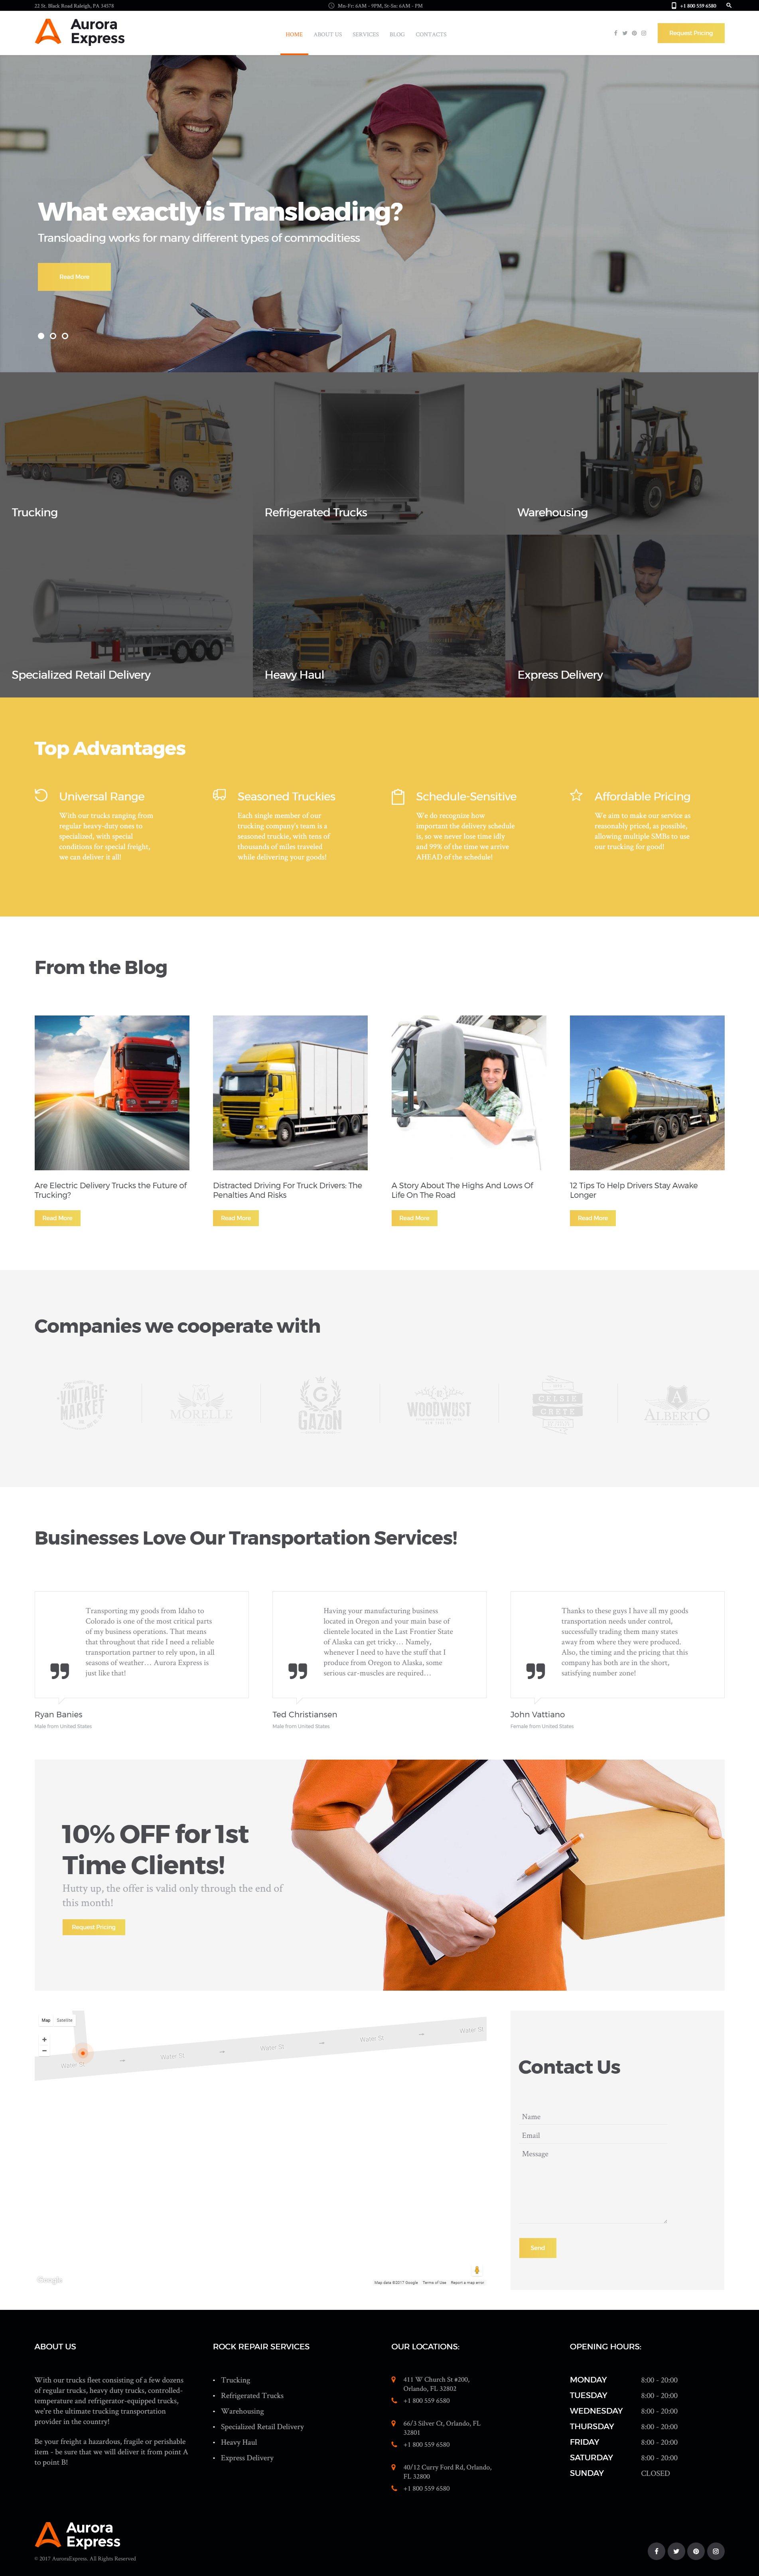 Responsywny motyw WordPress AuroraExpress - Transportation Company Responsive #60107